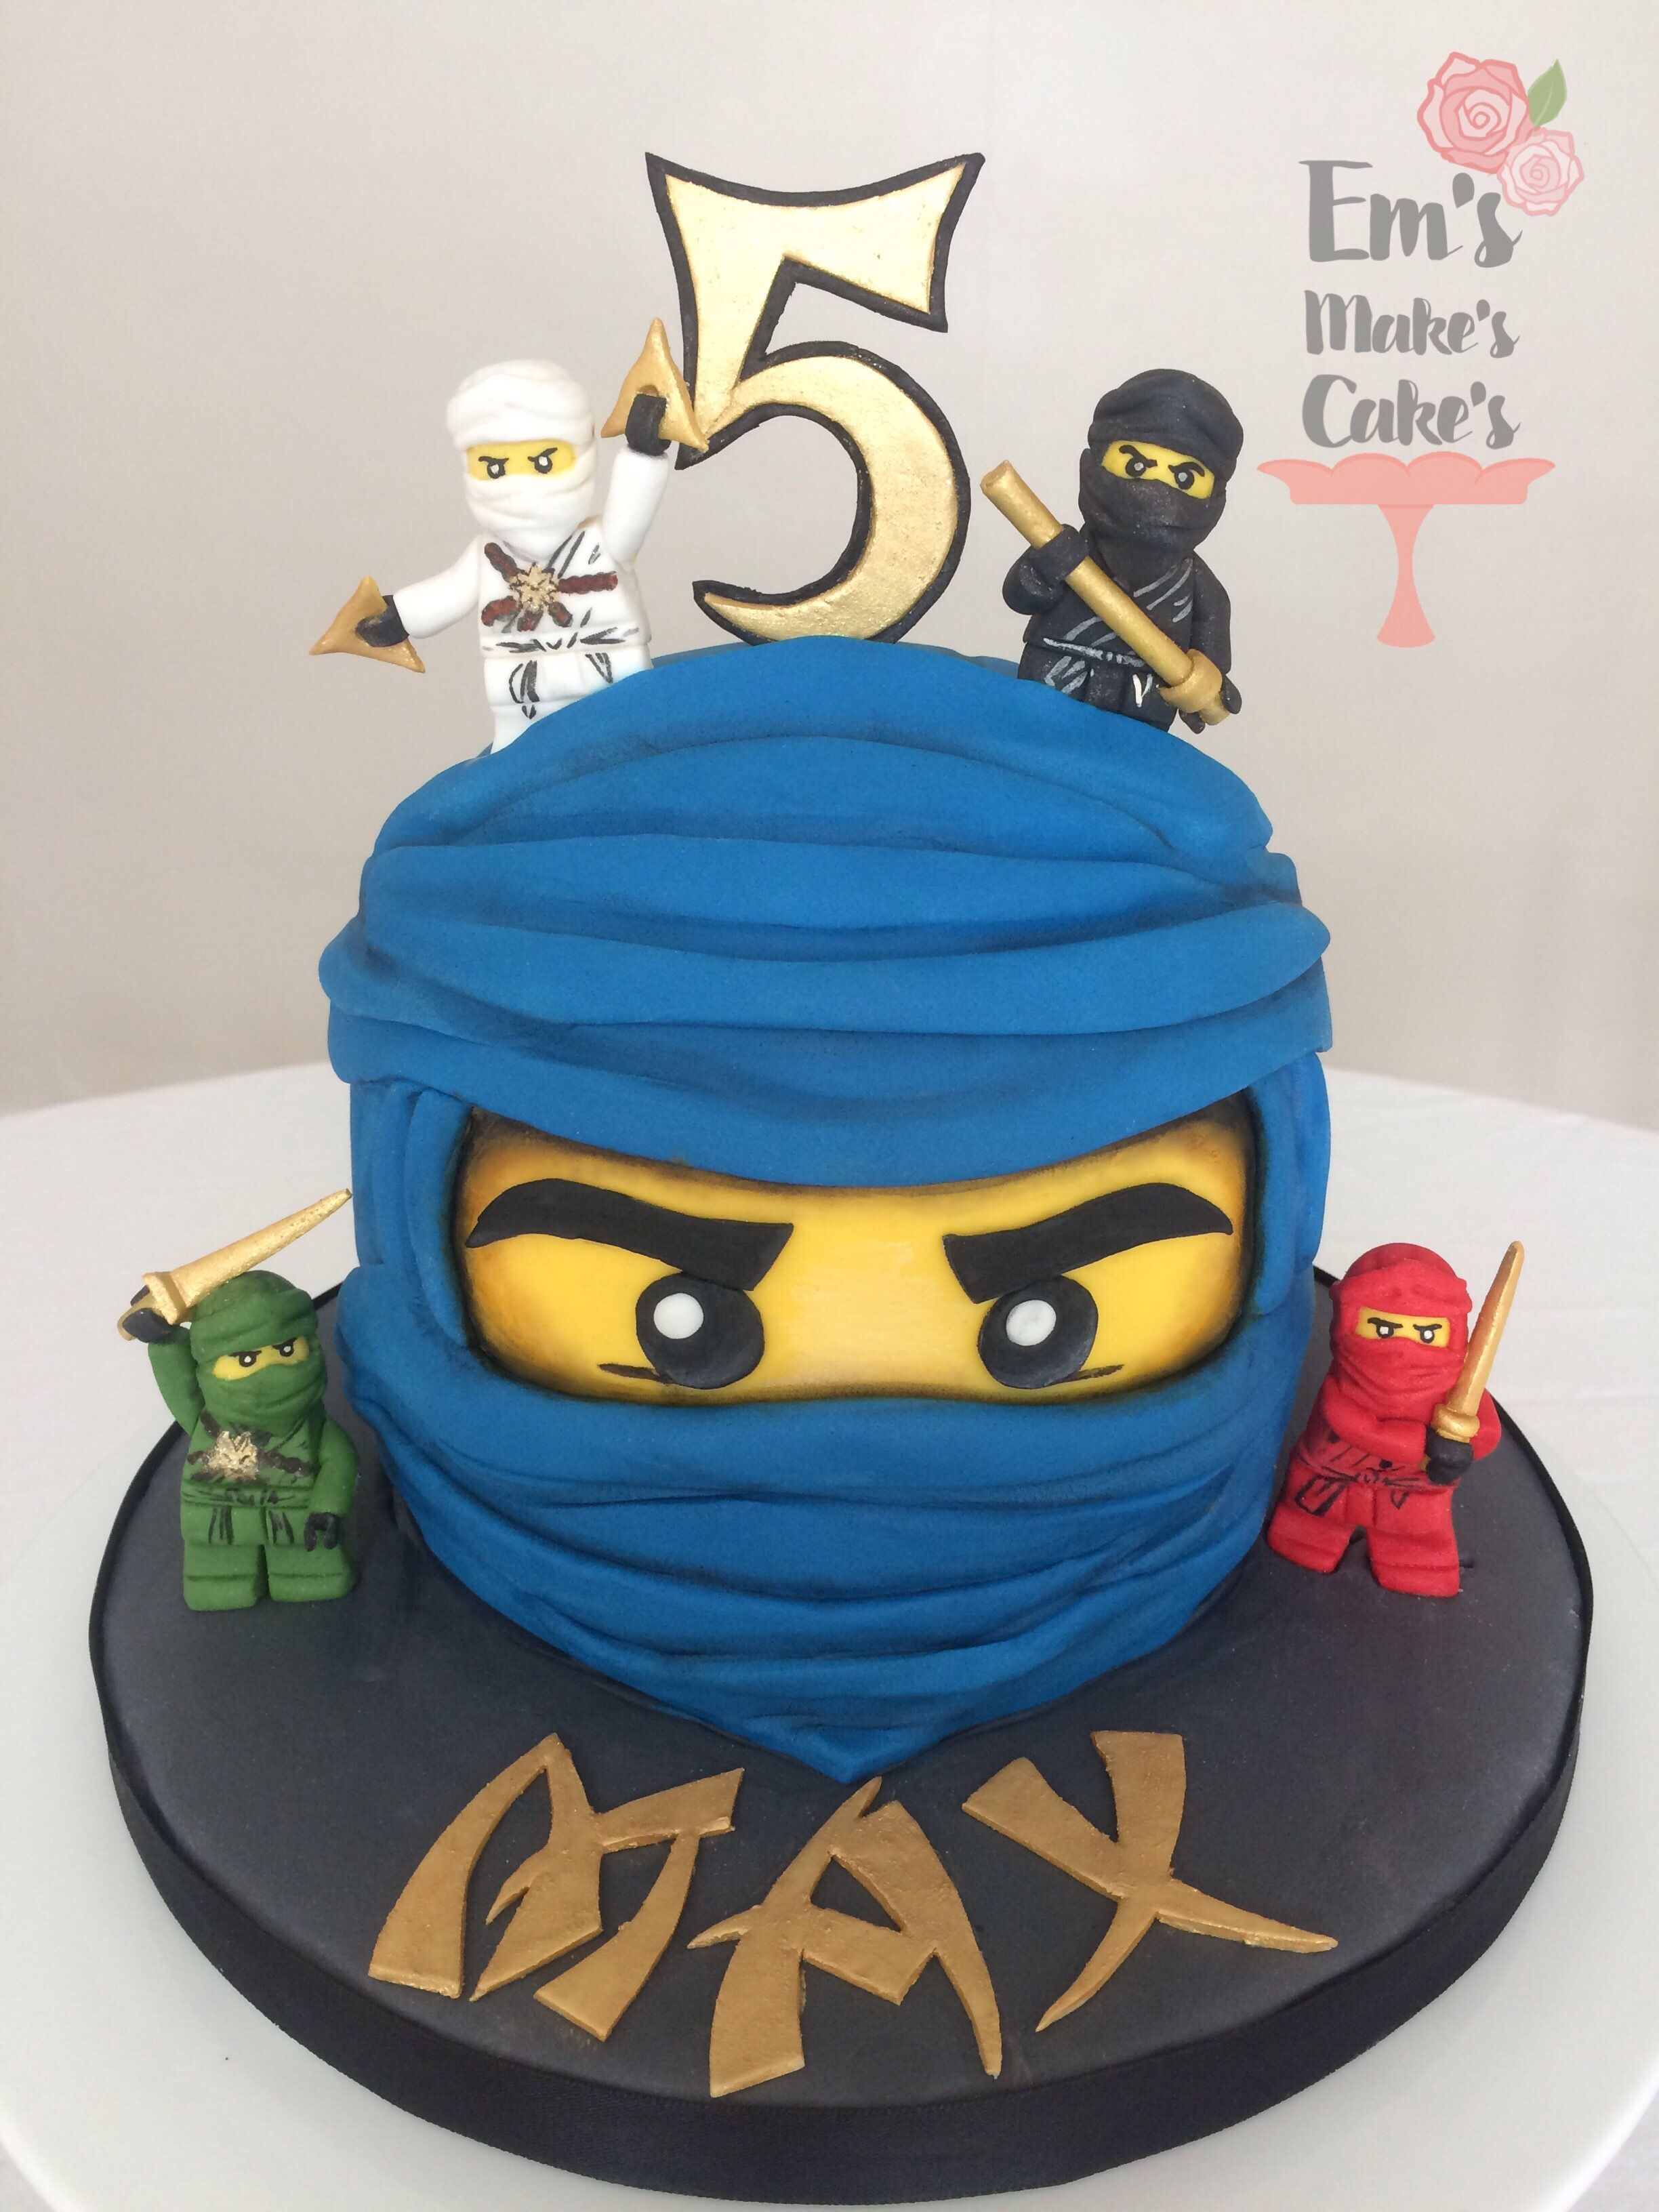 Pleasant Lego Ninjago Cake Lego Ninjago Birthday Ninja Birthday Parties Funny Birthday Cards Online Alyptdamsfinfo